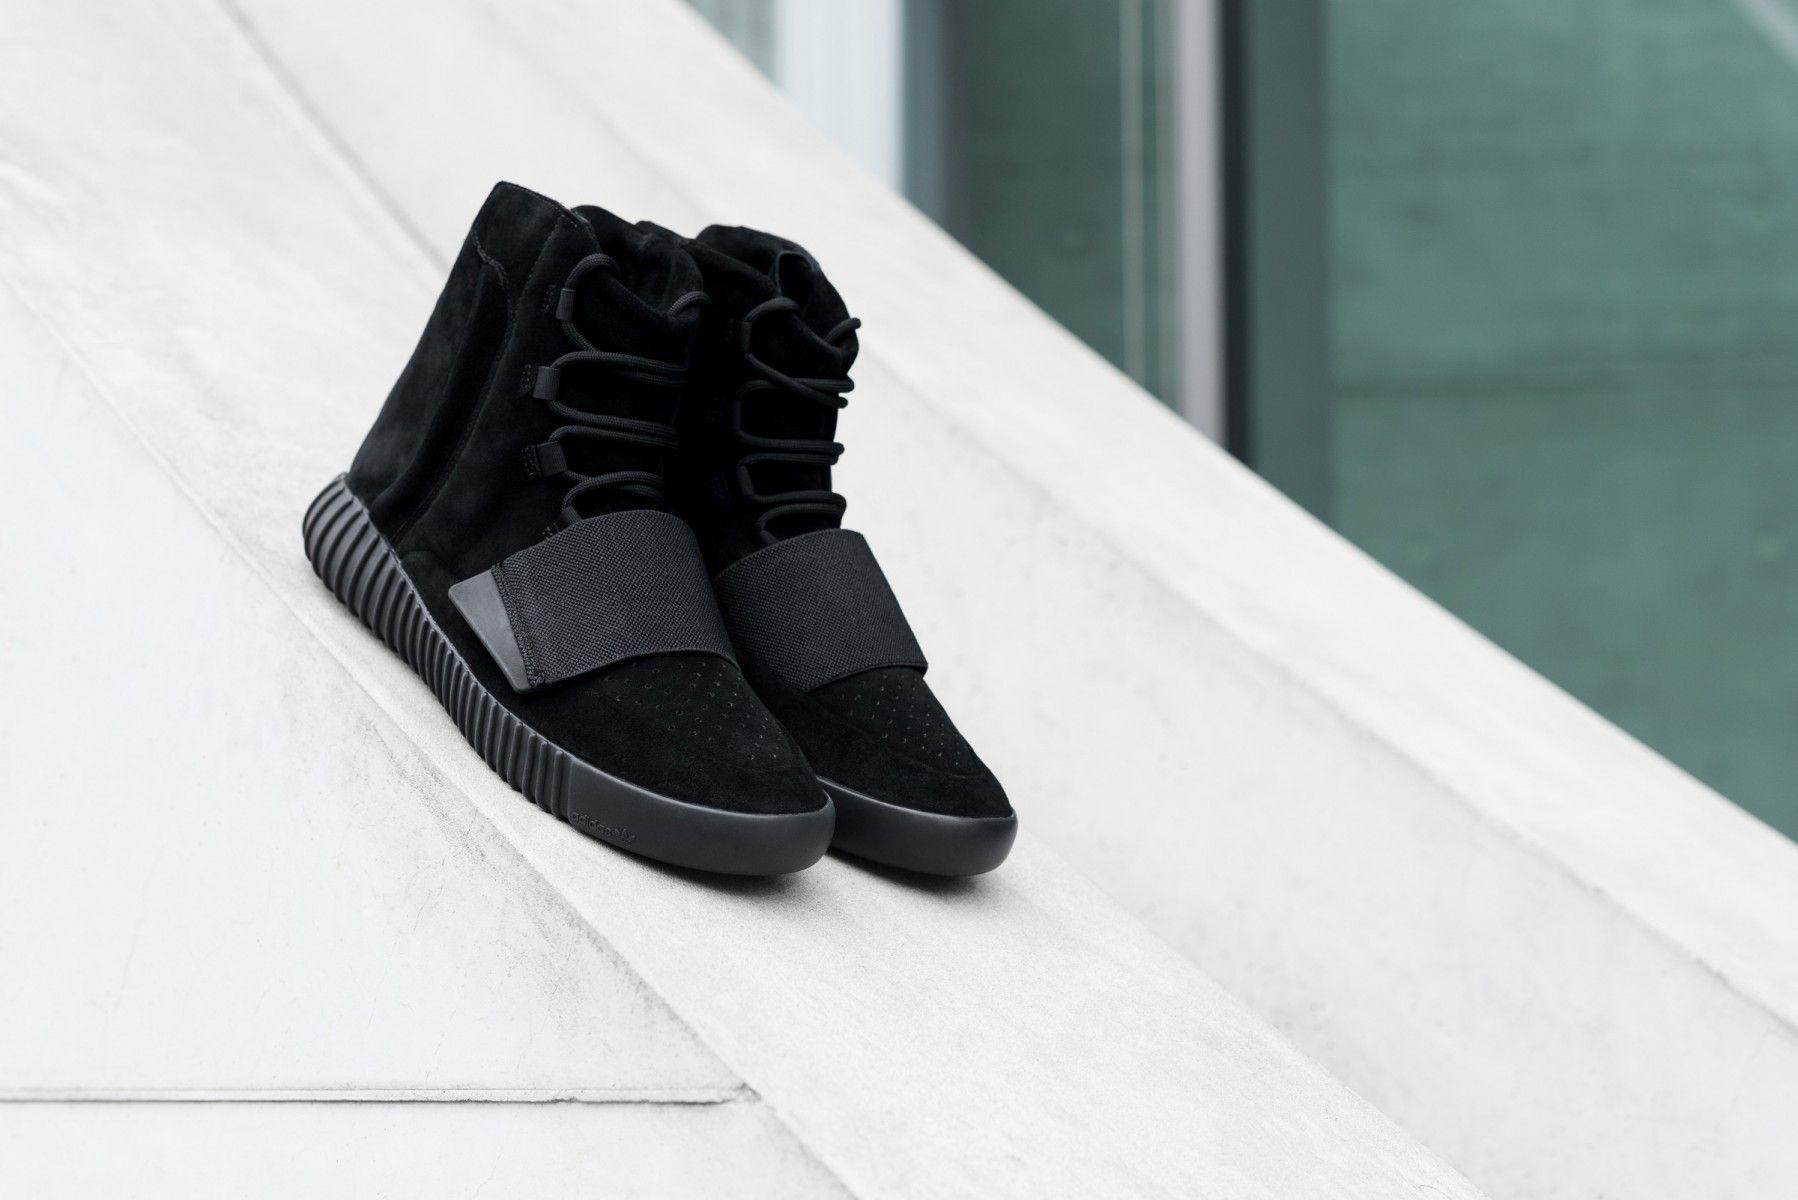 adidas YEEZY Boost 750 Black Best Photos | Highsnobiety